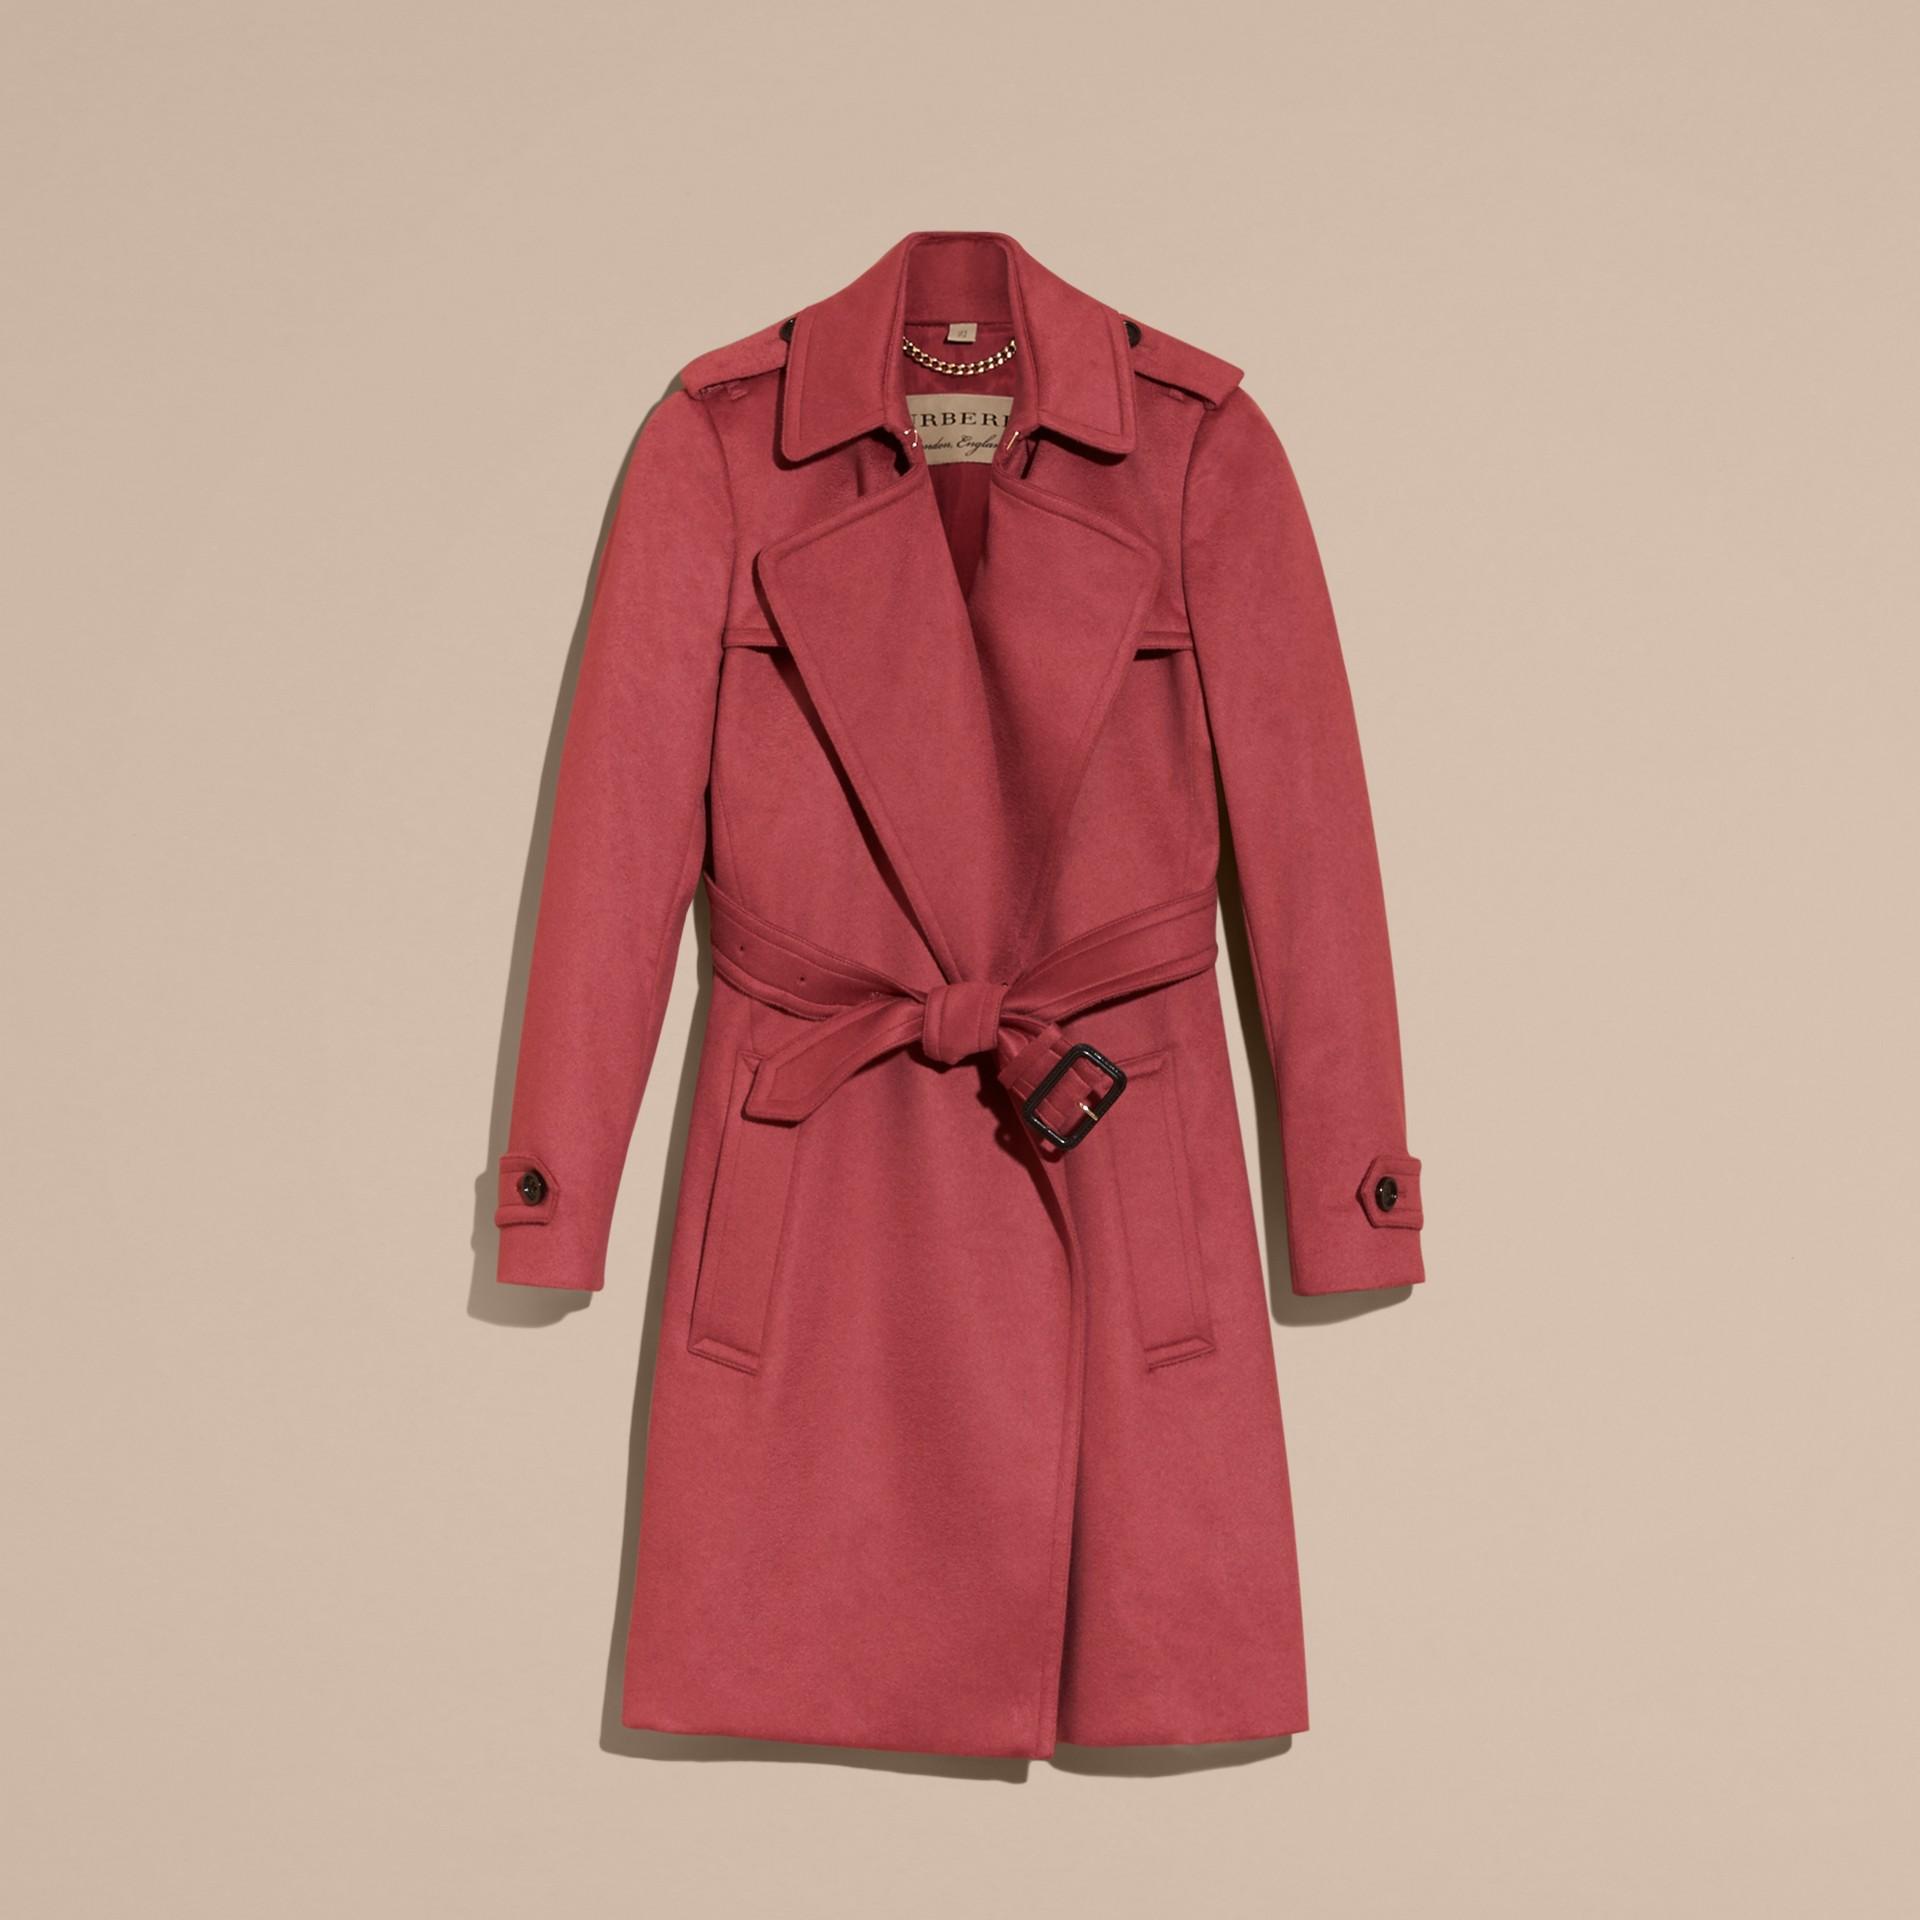 Rose pivoine cendrée Trench-coat portefeuille en cachemire Rose Pivoine Cendrée - photo de la galerie 4